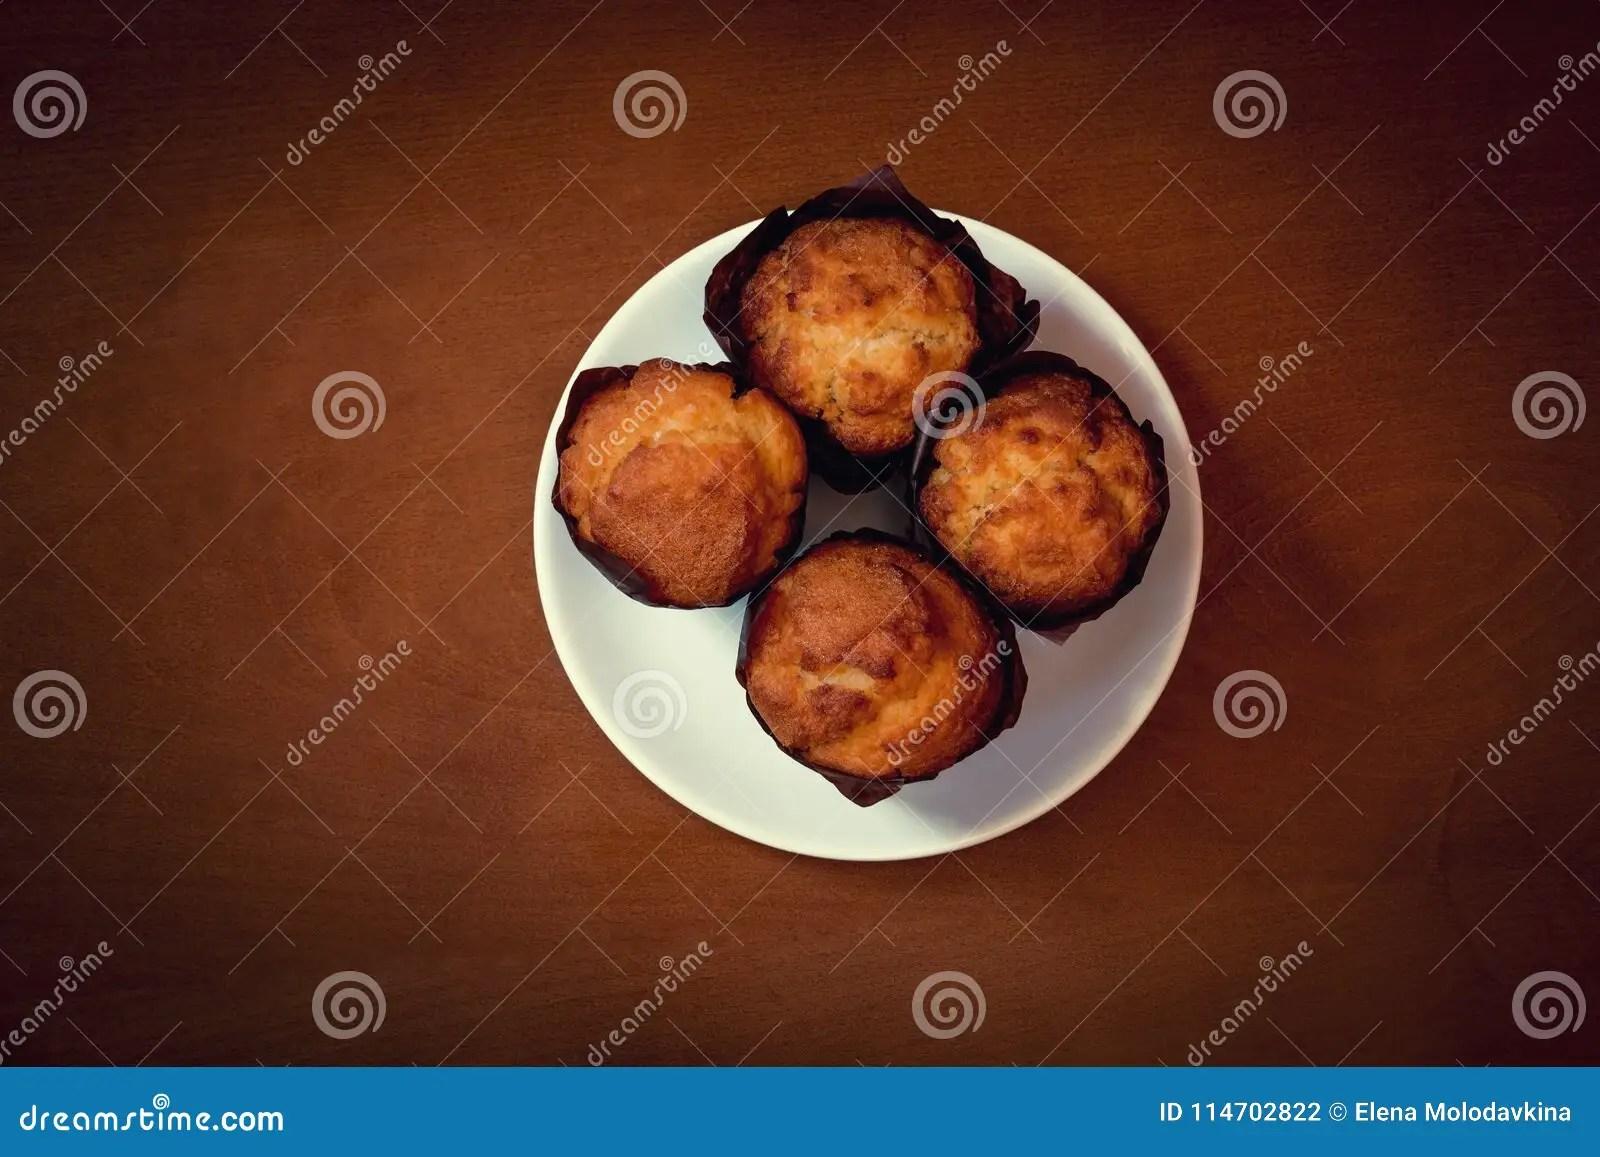 Vanilla Muffins In Paper Cupcake Holders. Stock Photo